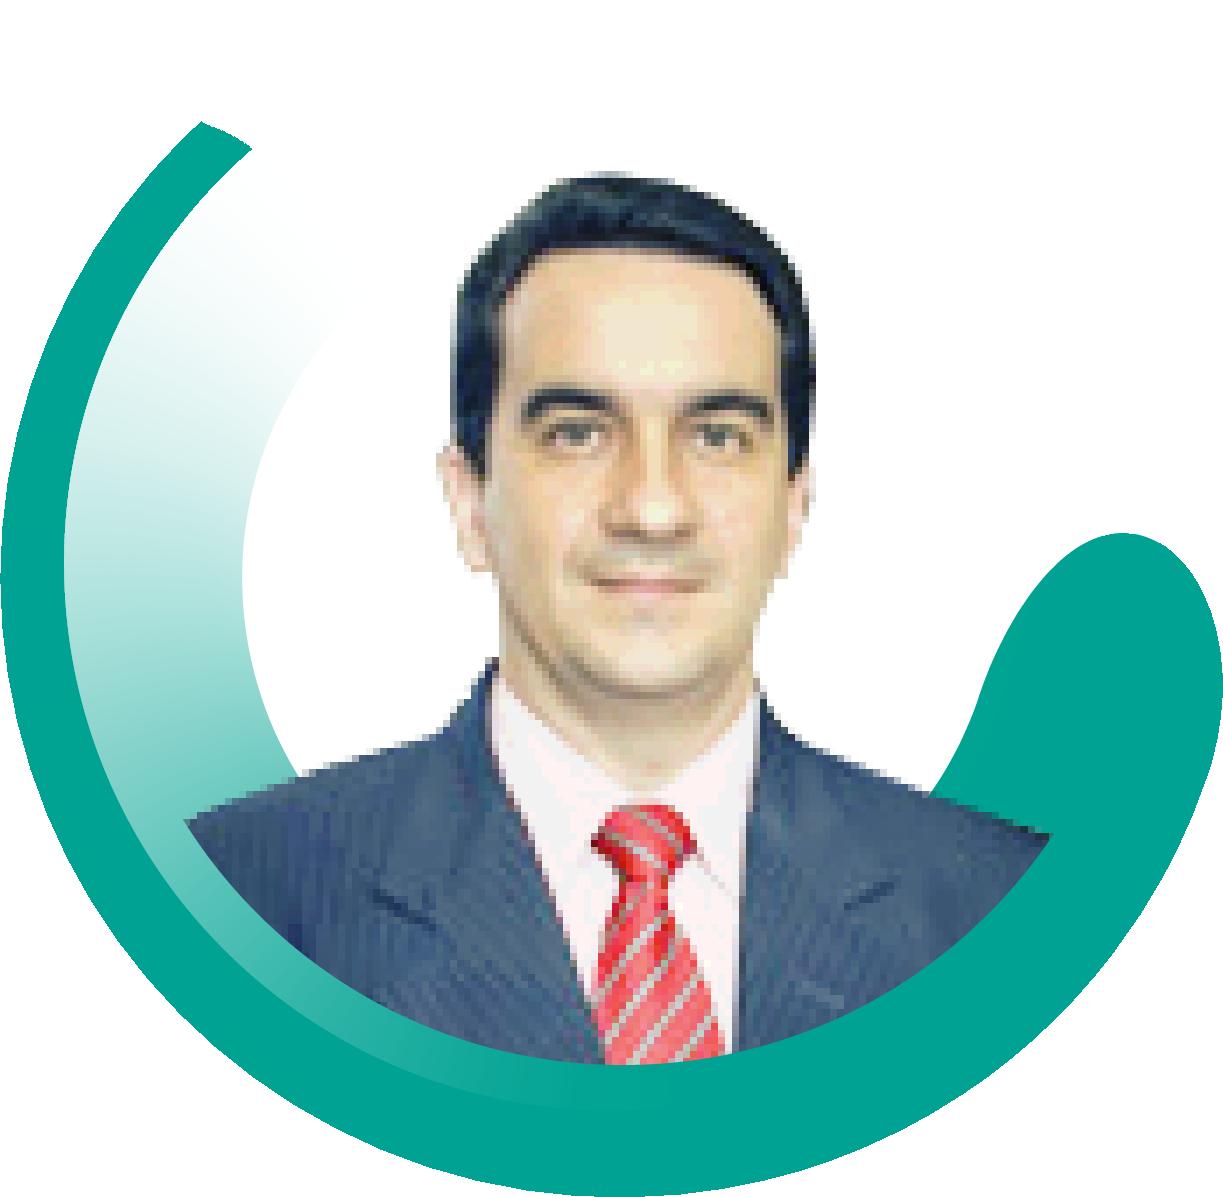 Marcelo Barroso